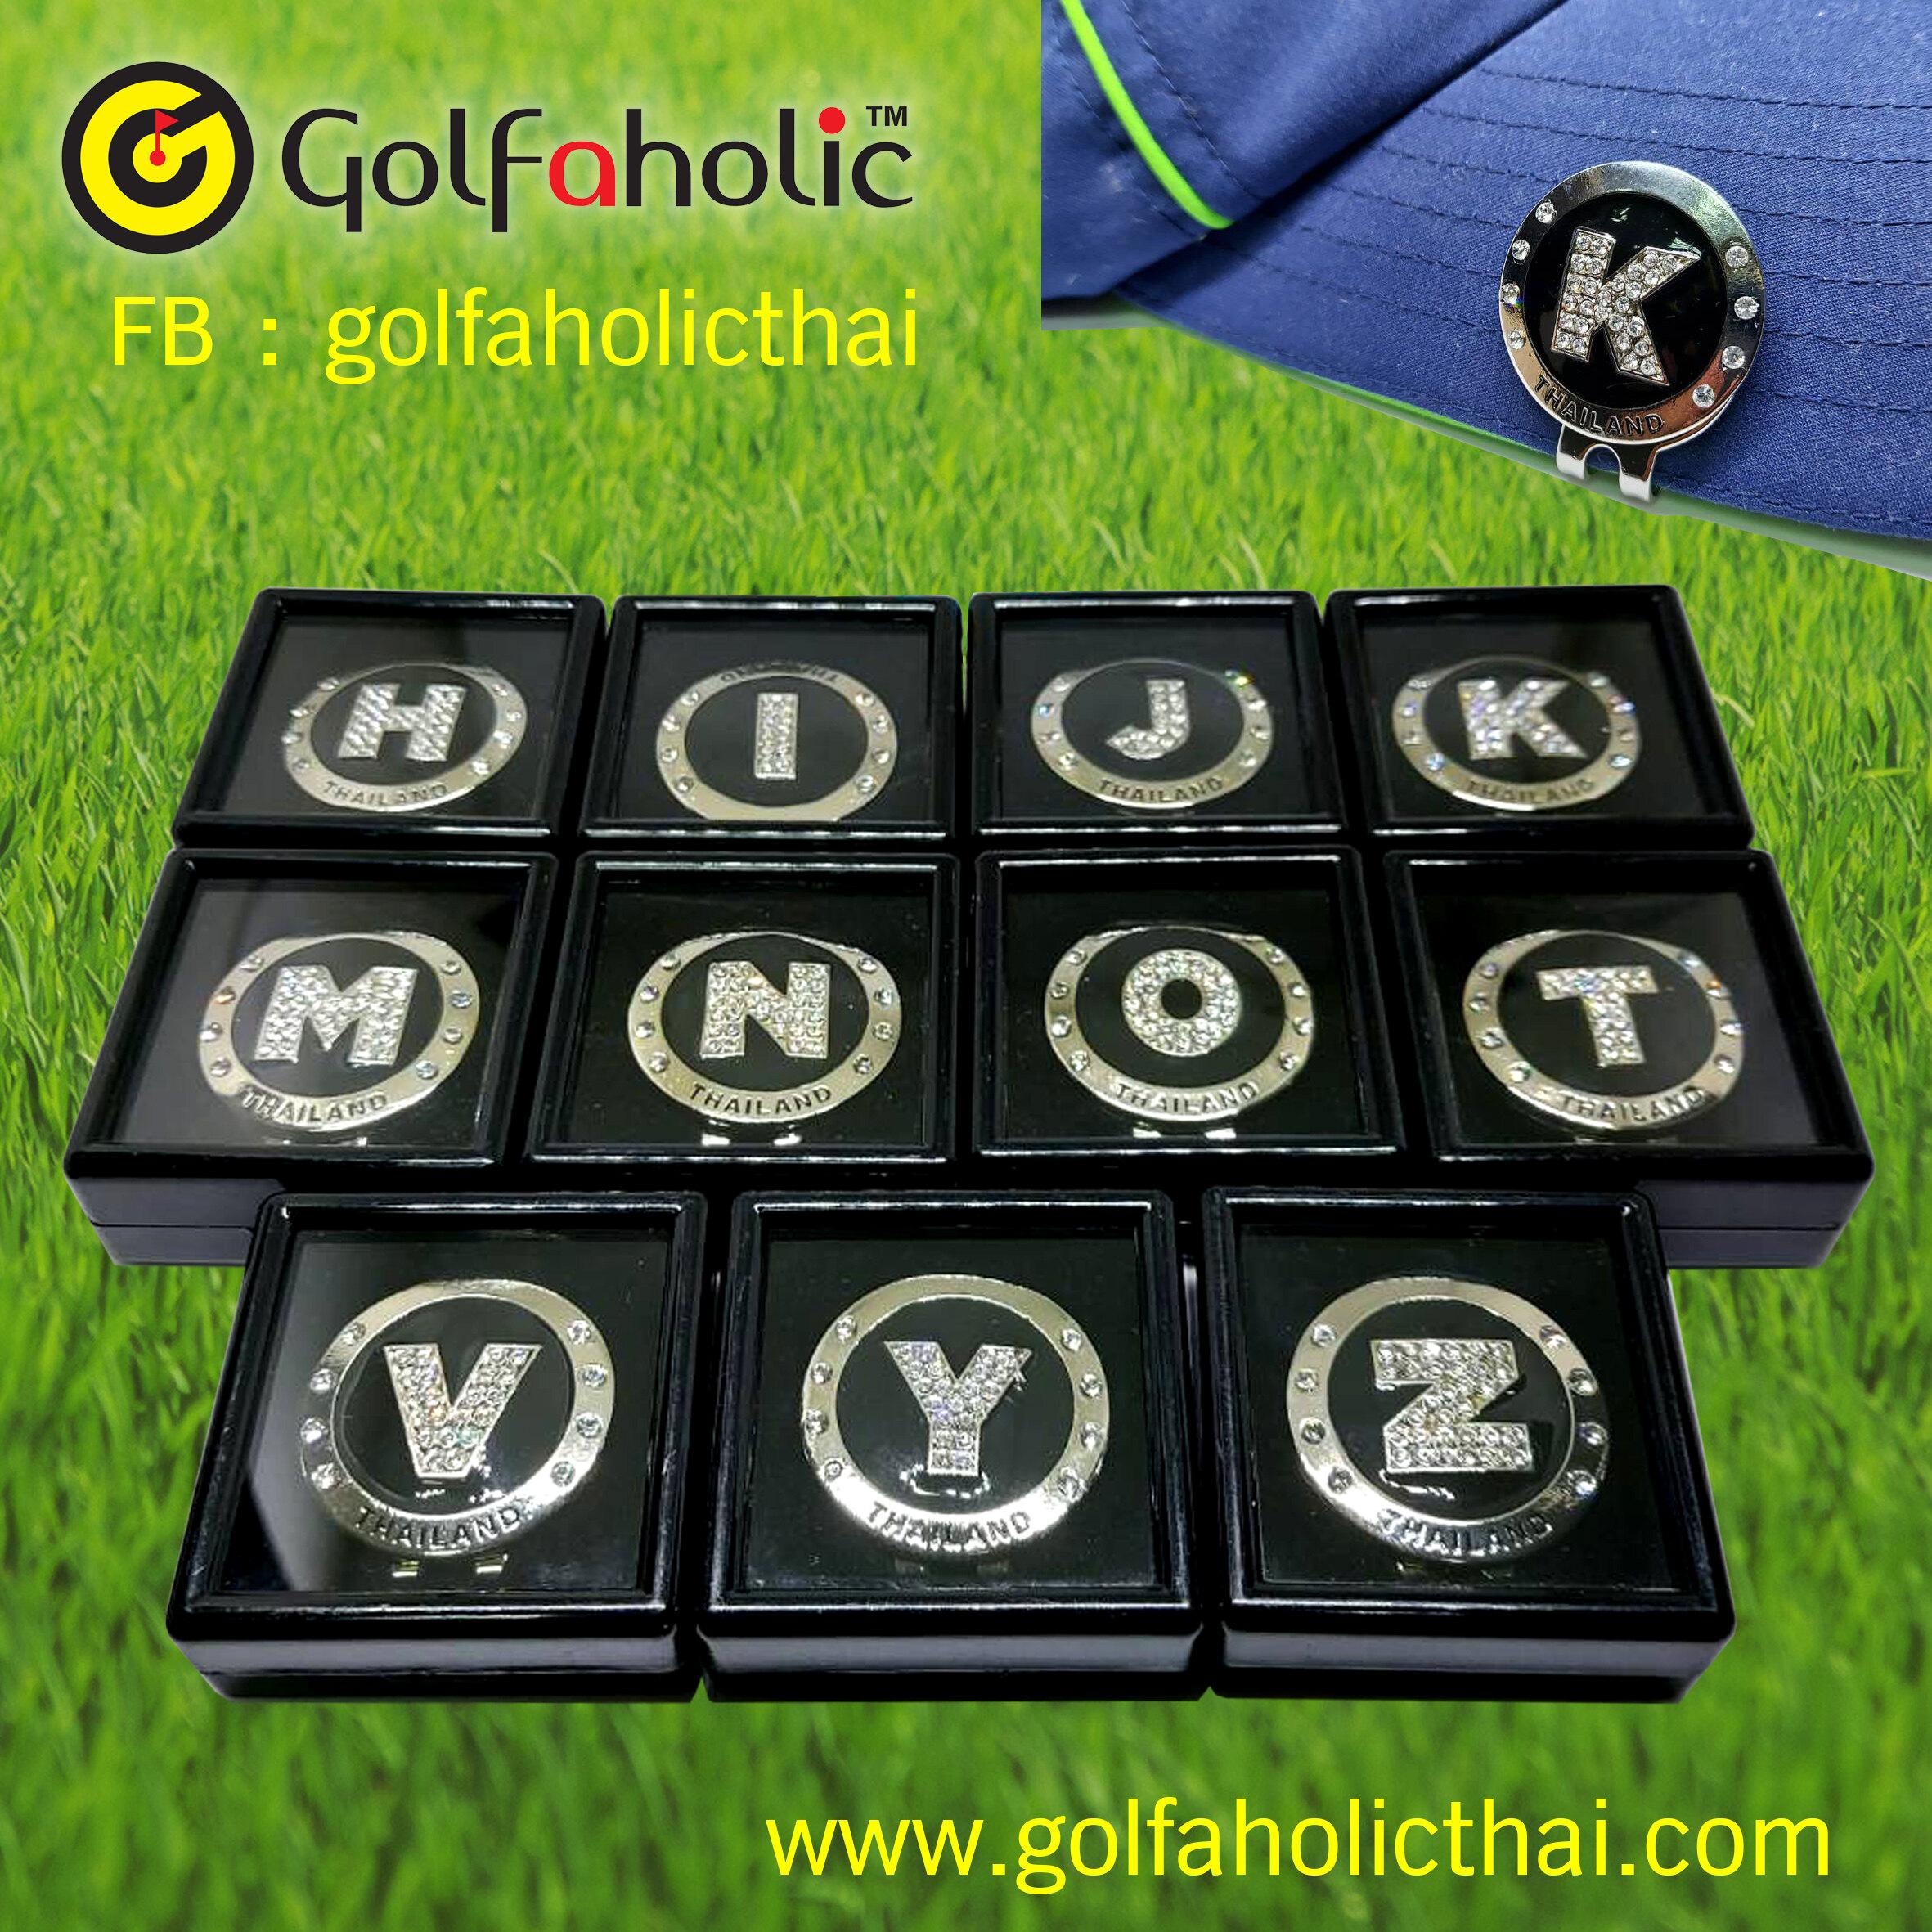 Golfaholic Crtstal Golf Magnetic Ball Markers Alphabets - กอล์ฟ บอลมาร์คเกอร์ ตัวอักษรอังกฤษ ฝังคริสตัล.